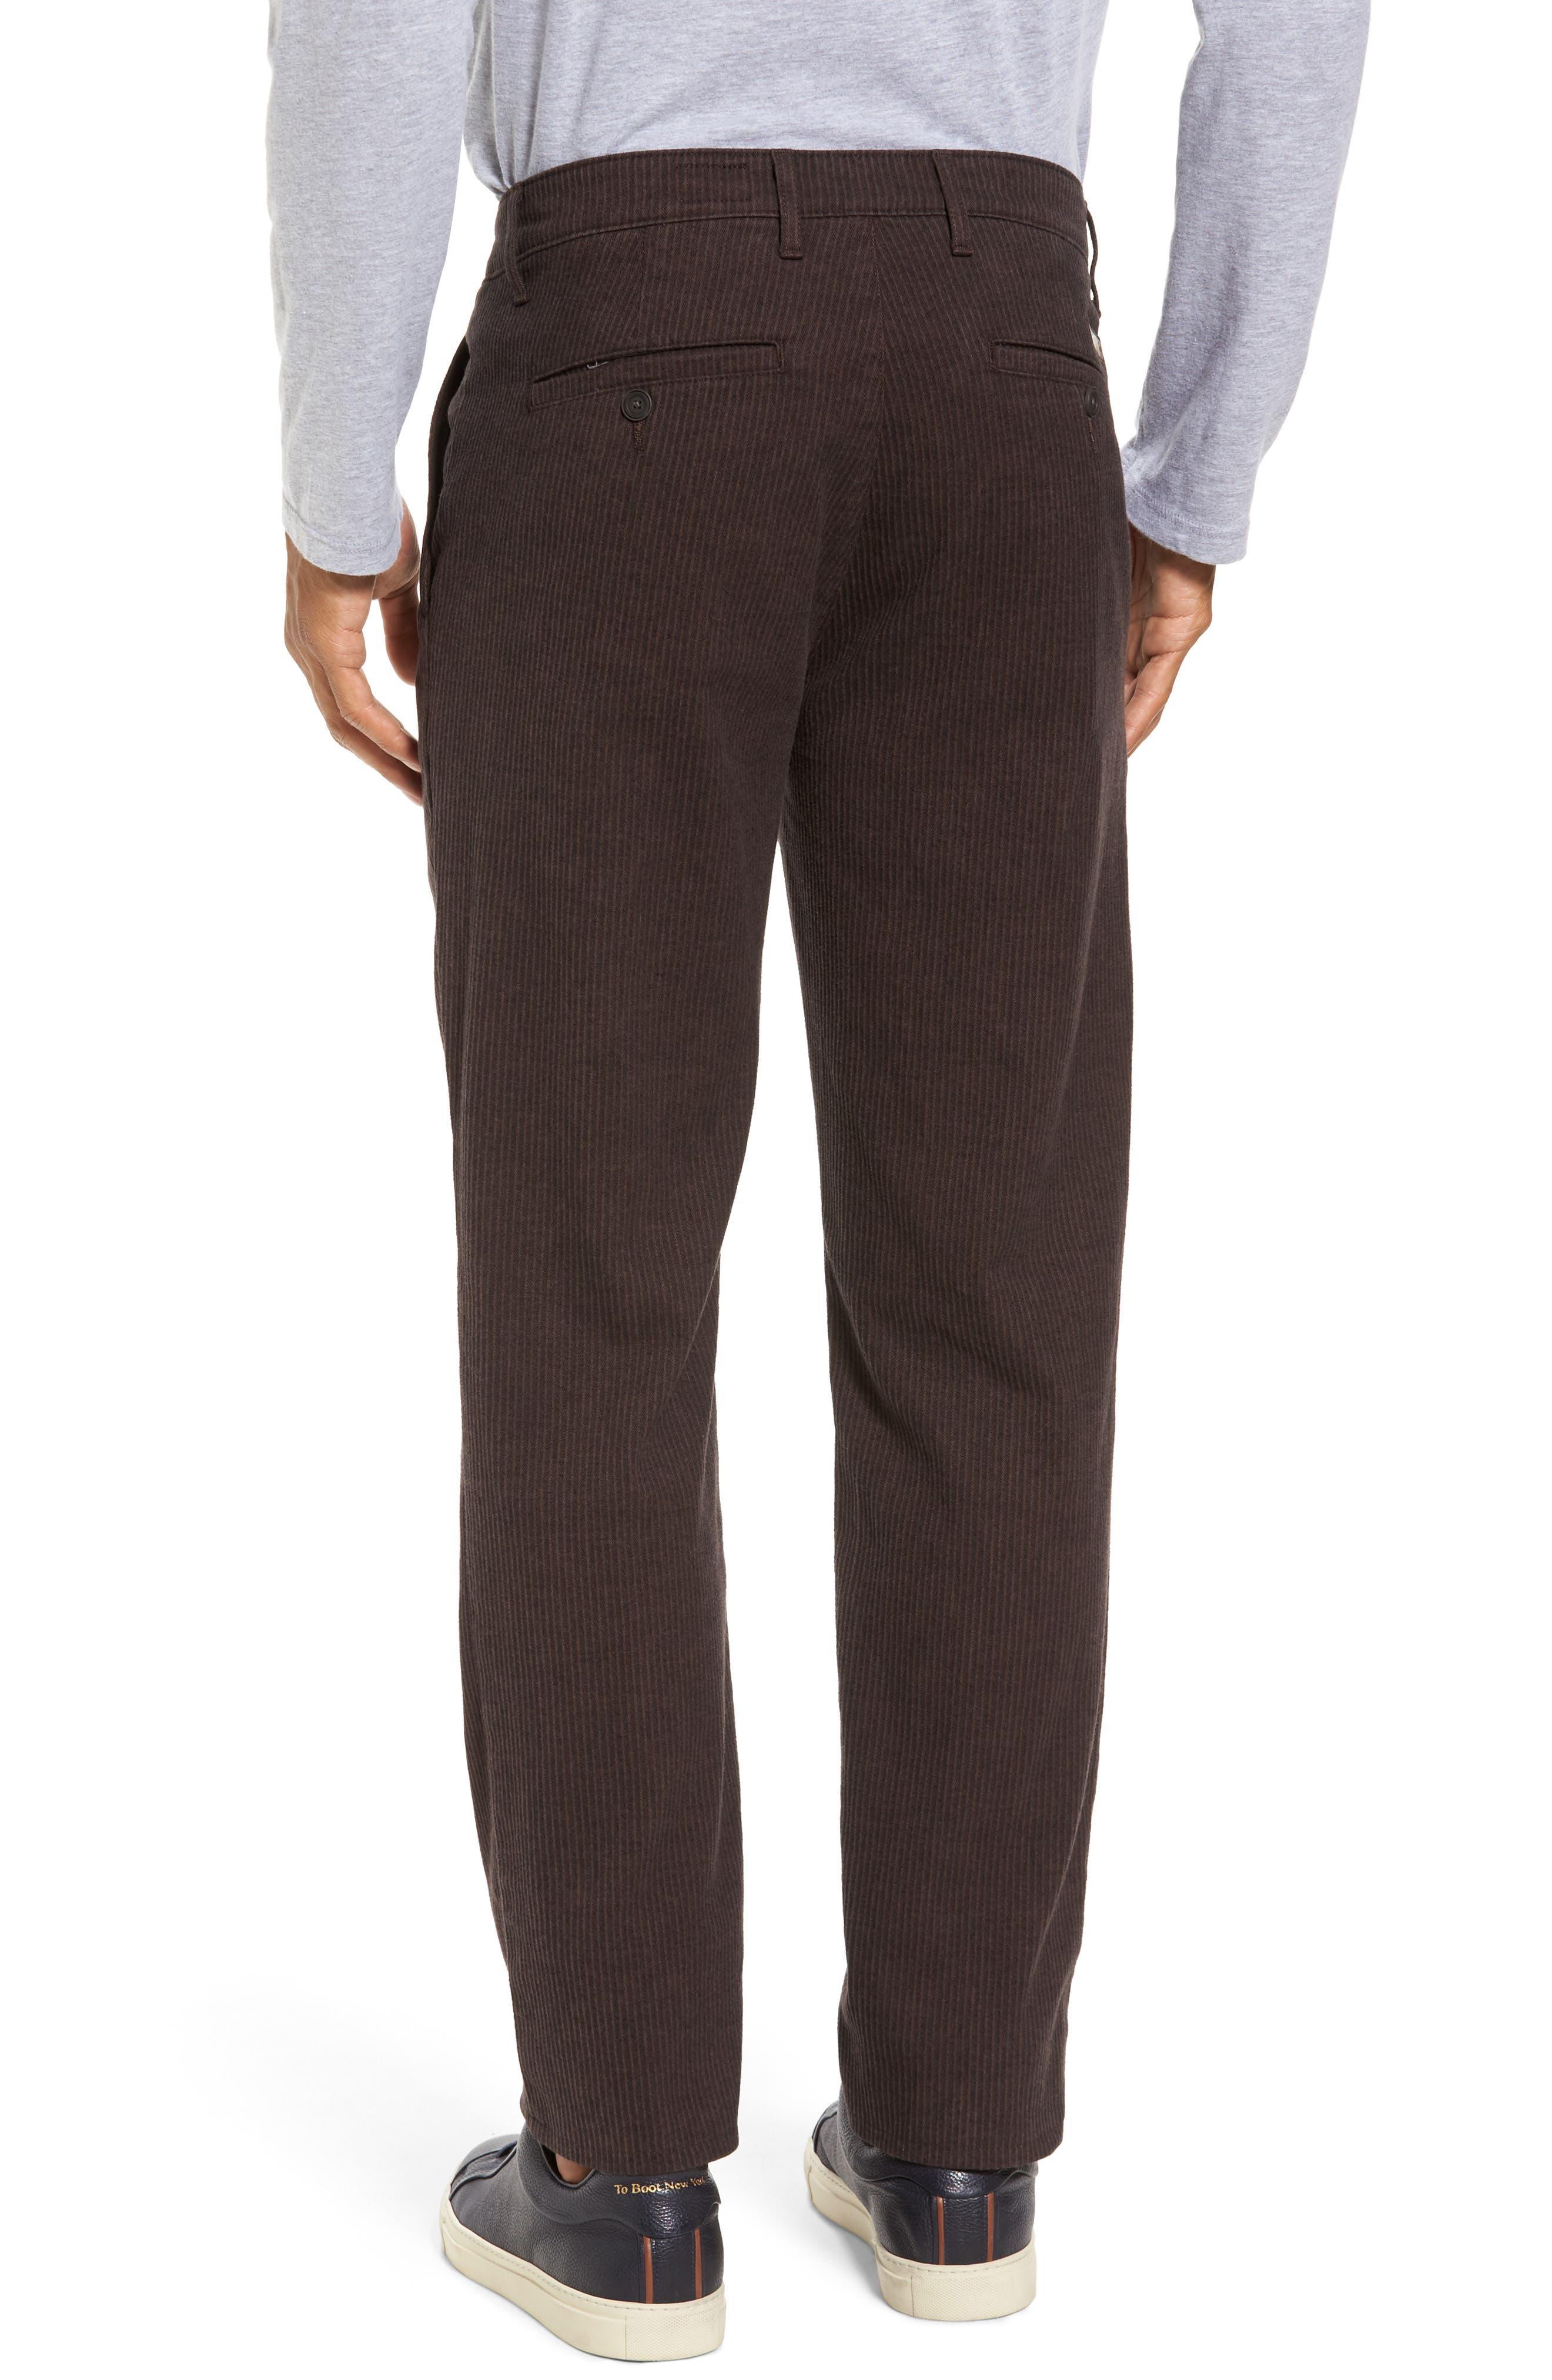 Marshall Slim Fit Pinstripe Pants,                             Alternate thumbnail 2, color,                             Dark Oakwood